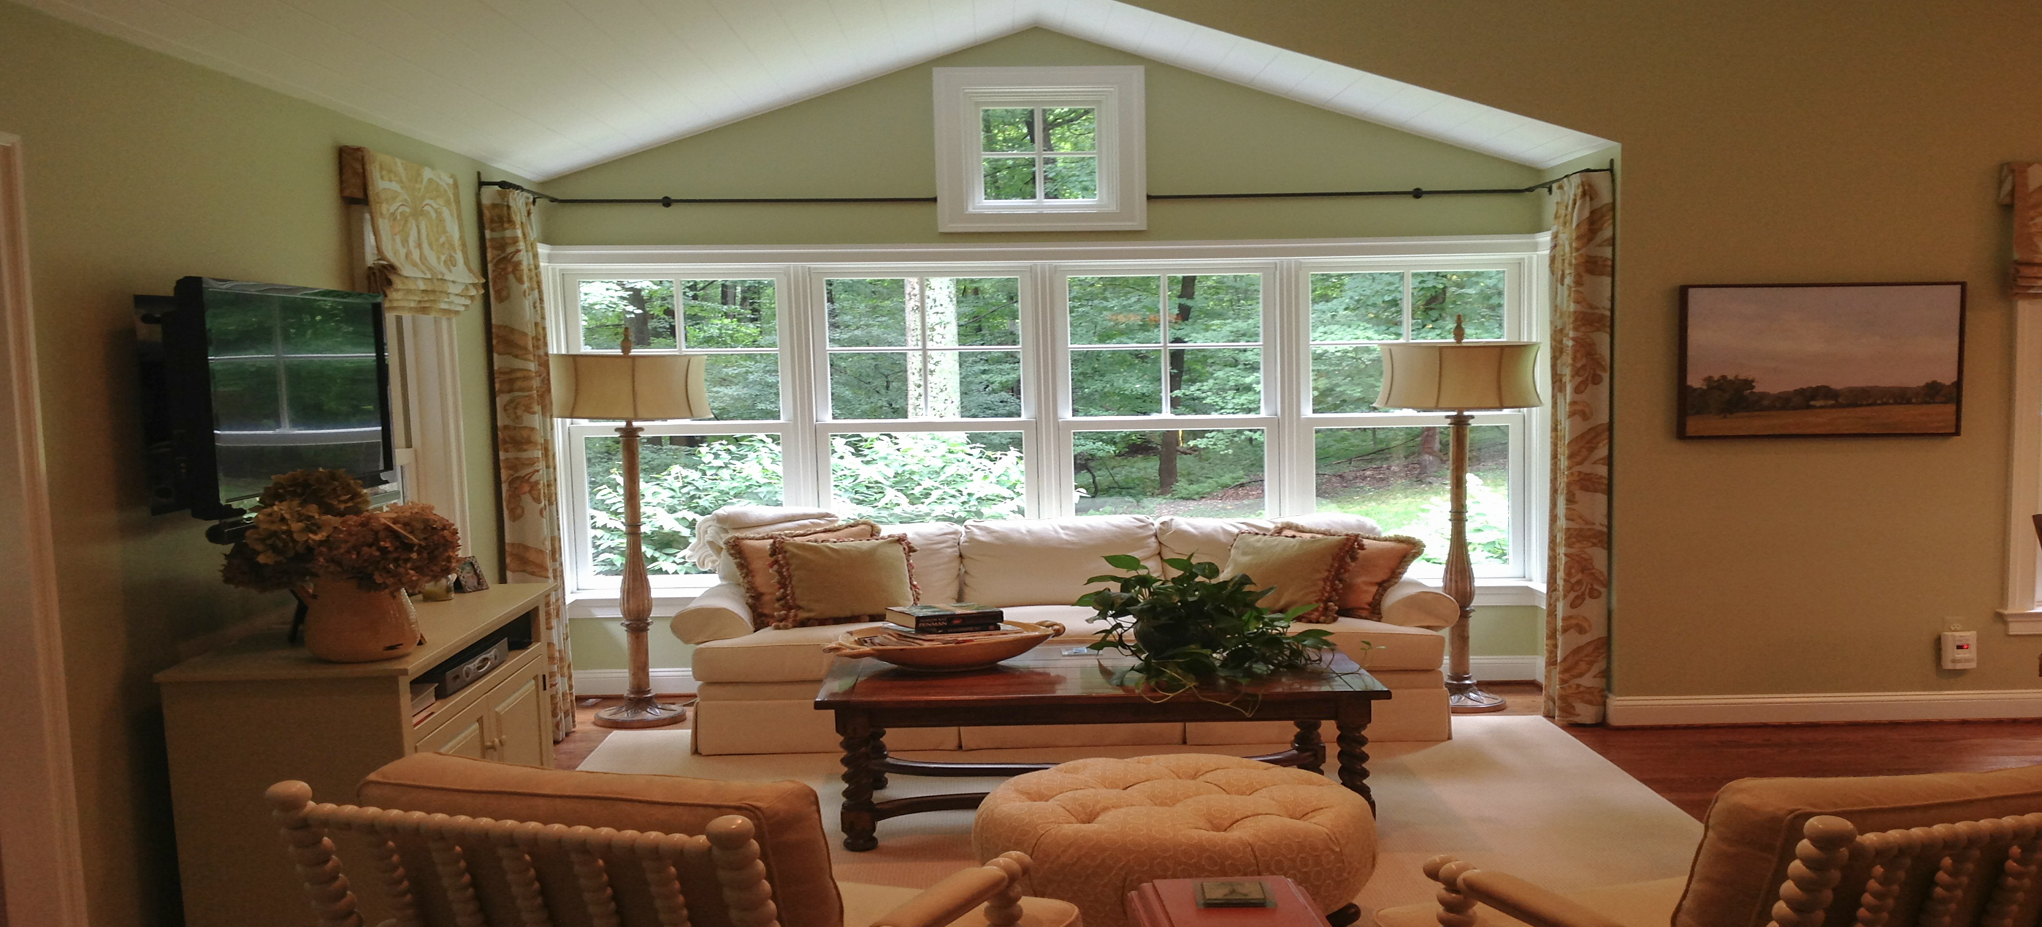 Full renovations legacy restorations for Legacy restoration